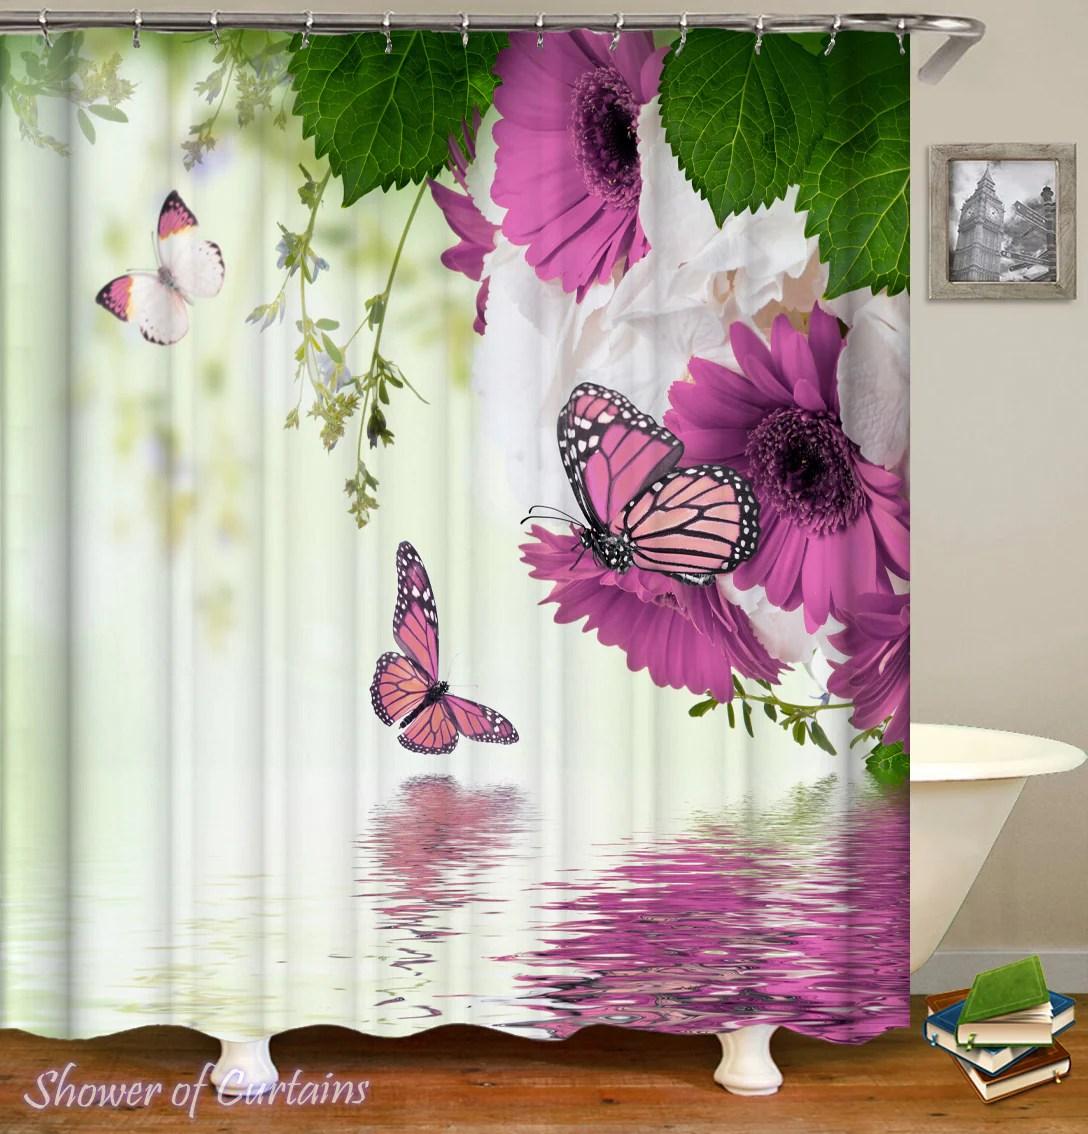 Purplish Flowers And Butterflies